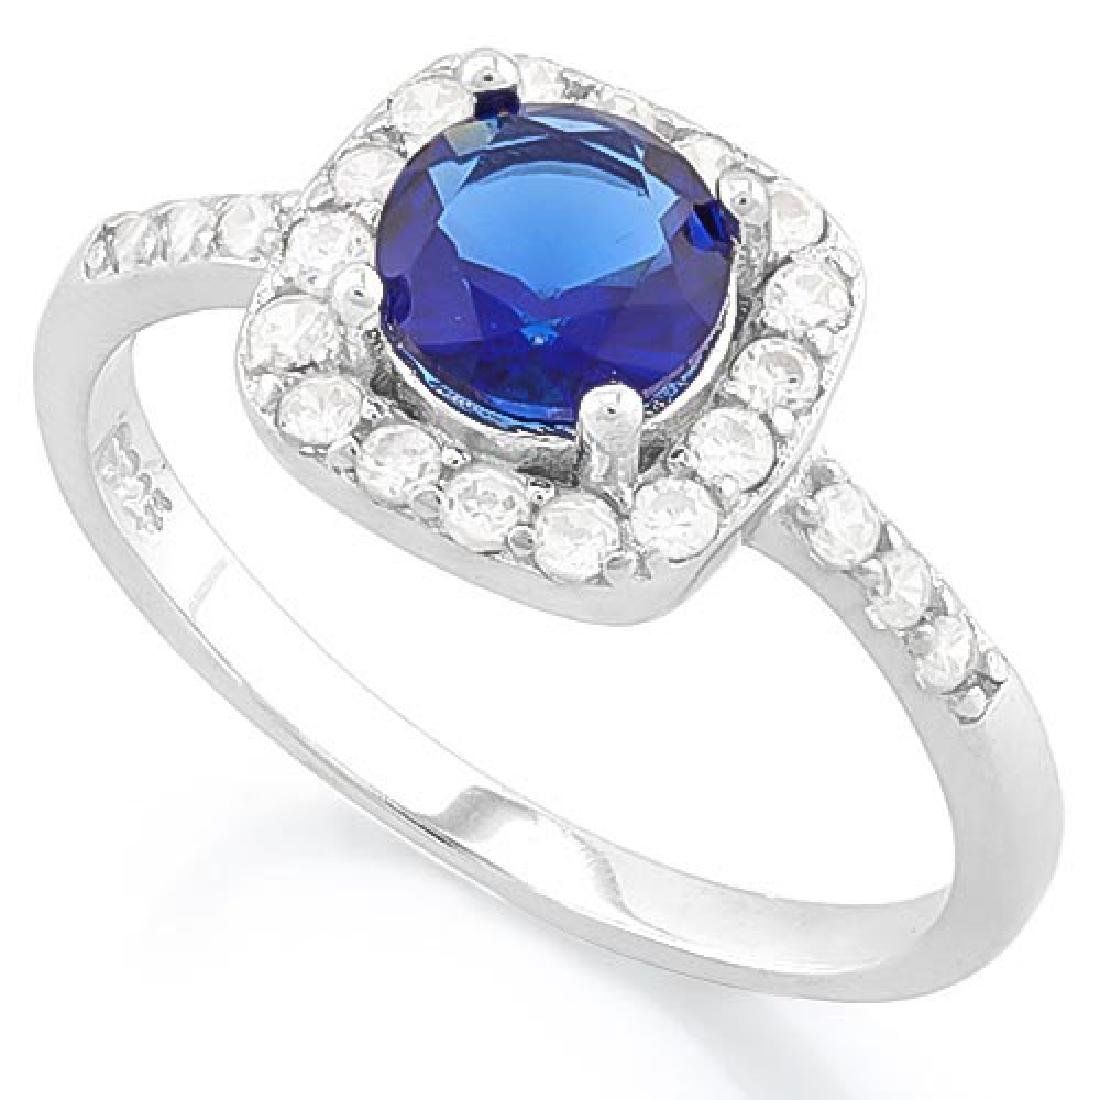 1 1/3 CTW CREATED BLUE SAPPHIRE & 1/4 CTW (26 PCS) FLAW